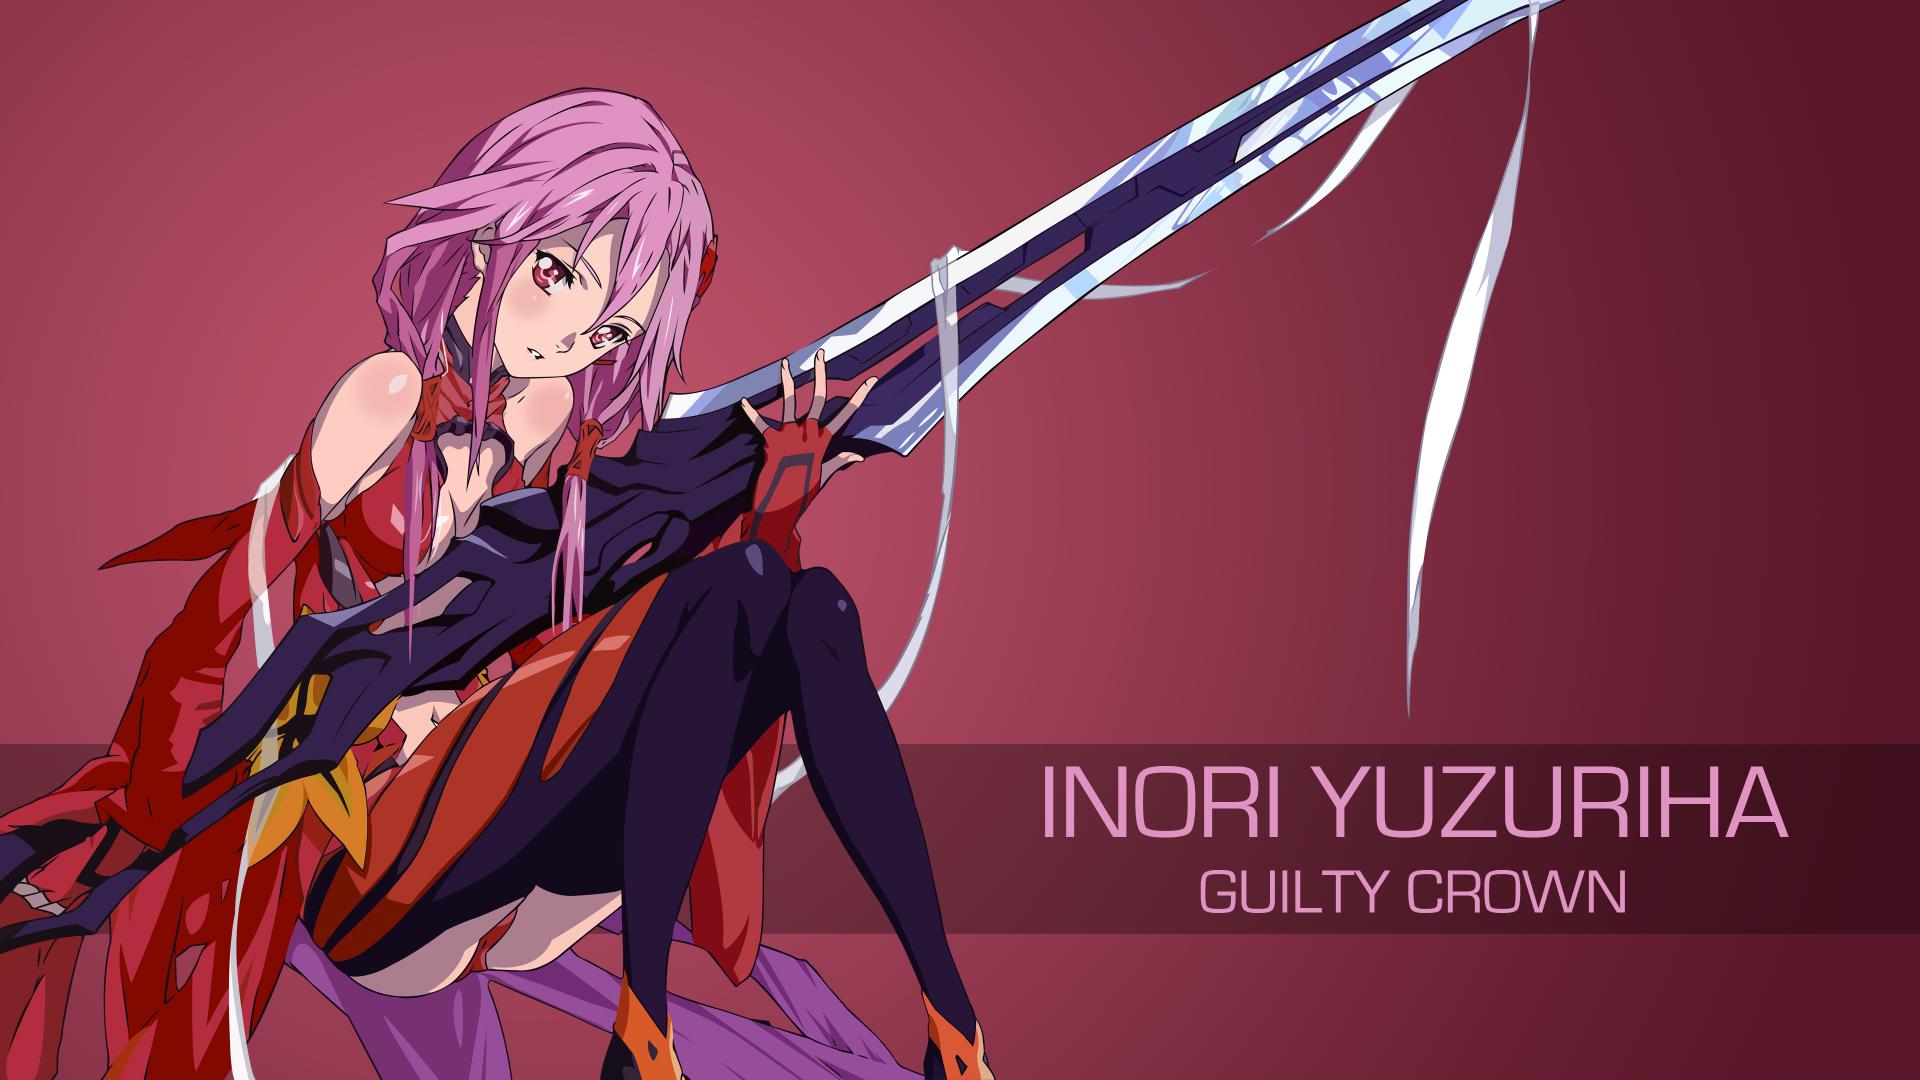 Anime Guilty Crown Inori Yuzuriha Fondo de Pantalla | Anime